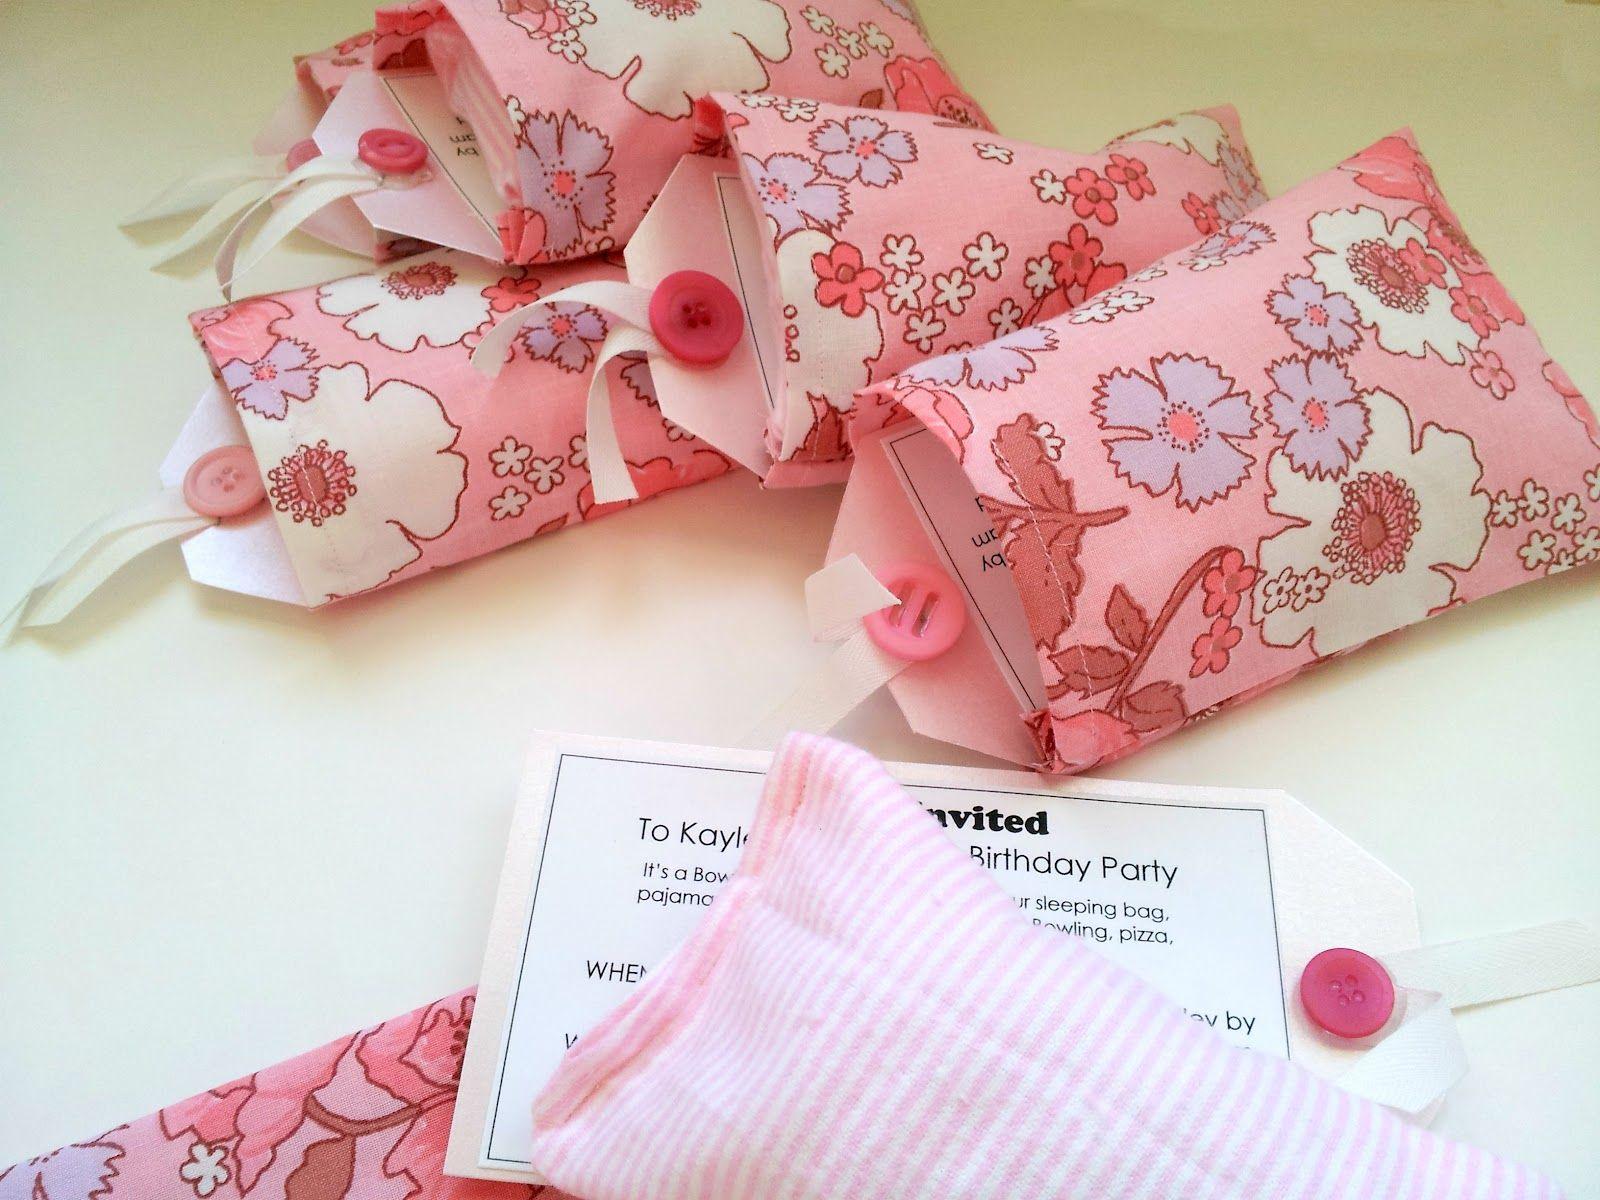 The Vintage Sheet Blog: Slumber Party Invitations | crafts ...